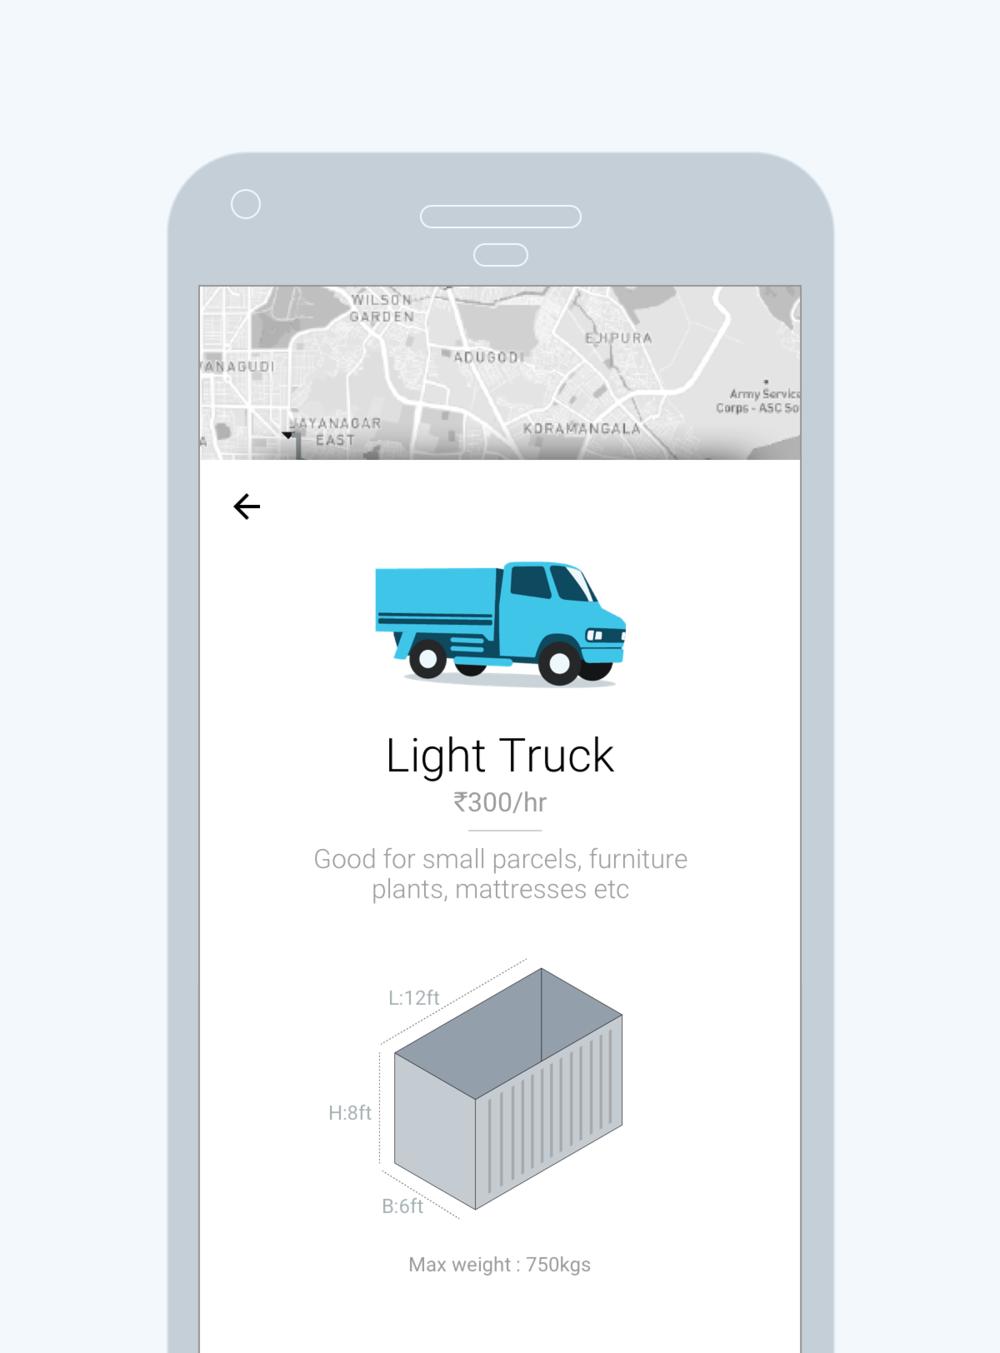 Truck Details